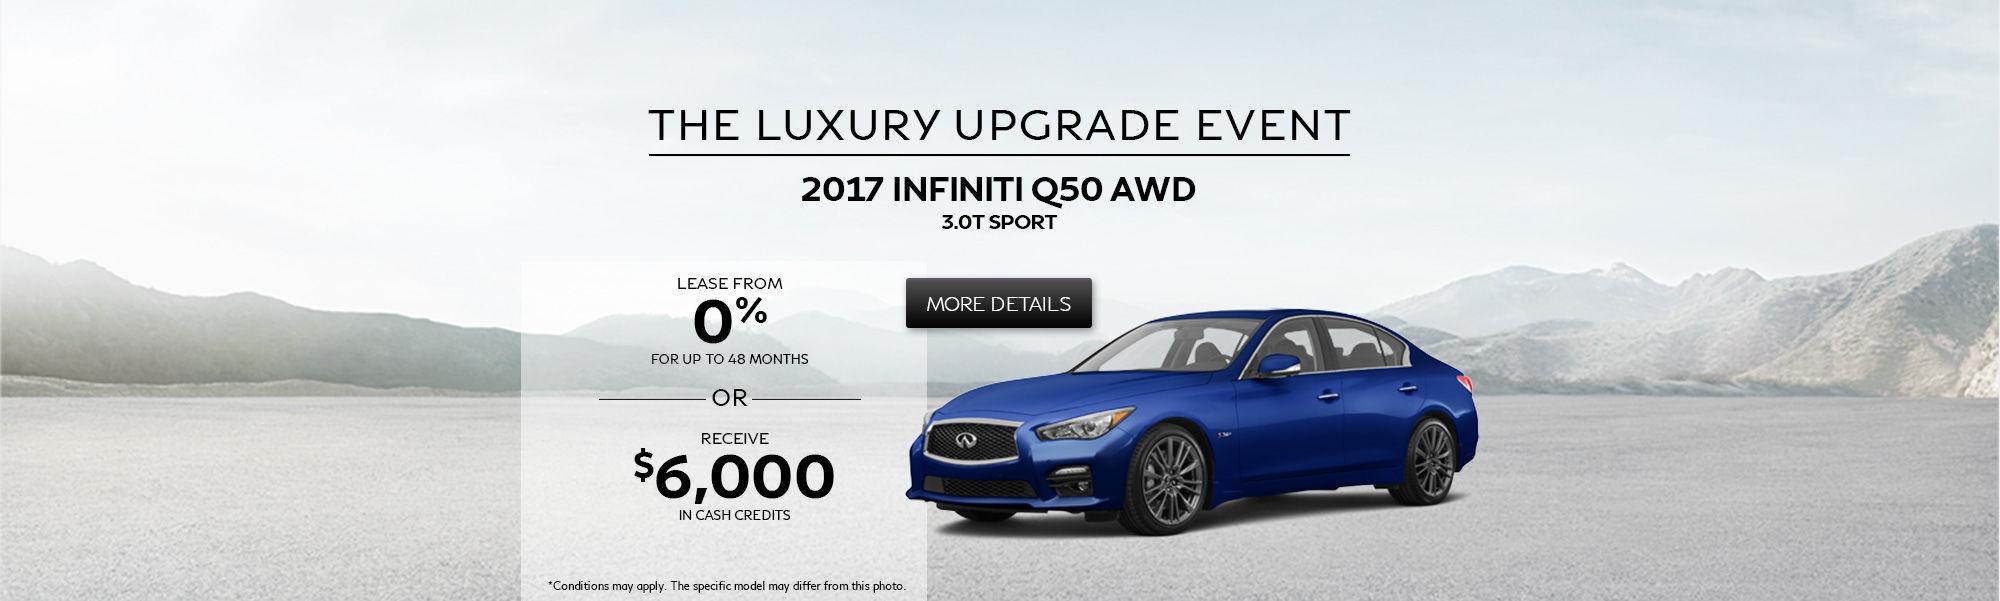 The Luxury Upgrade Event - Q50 AWD